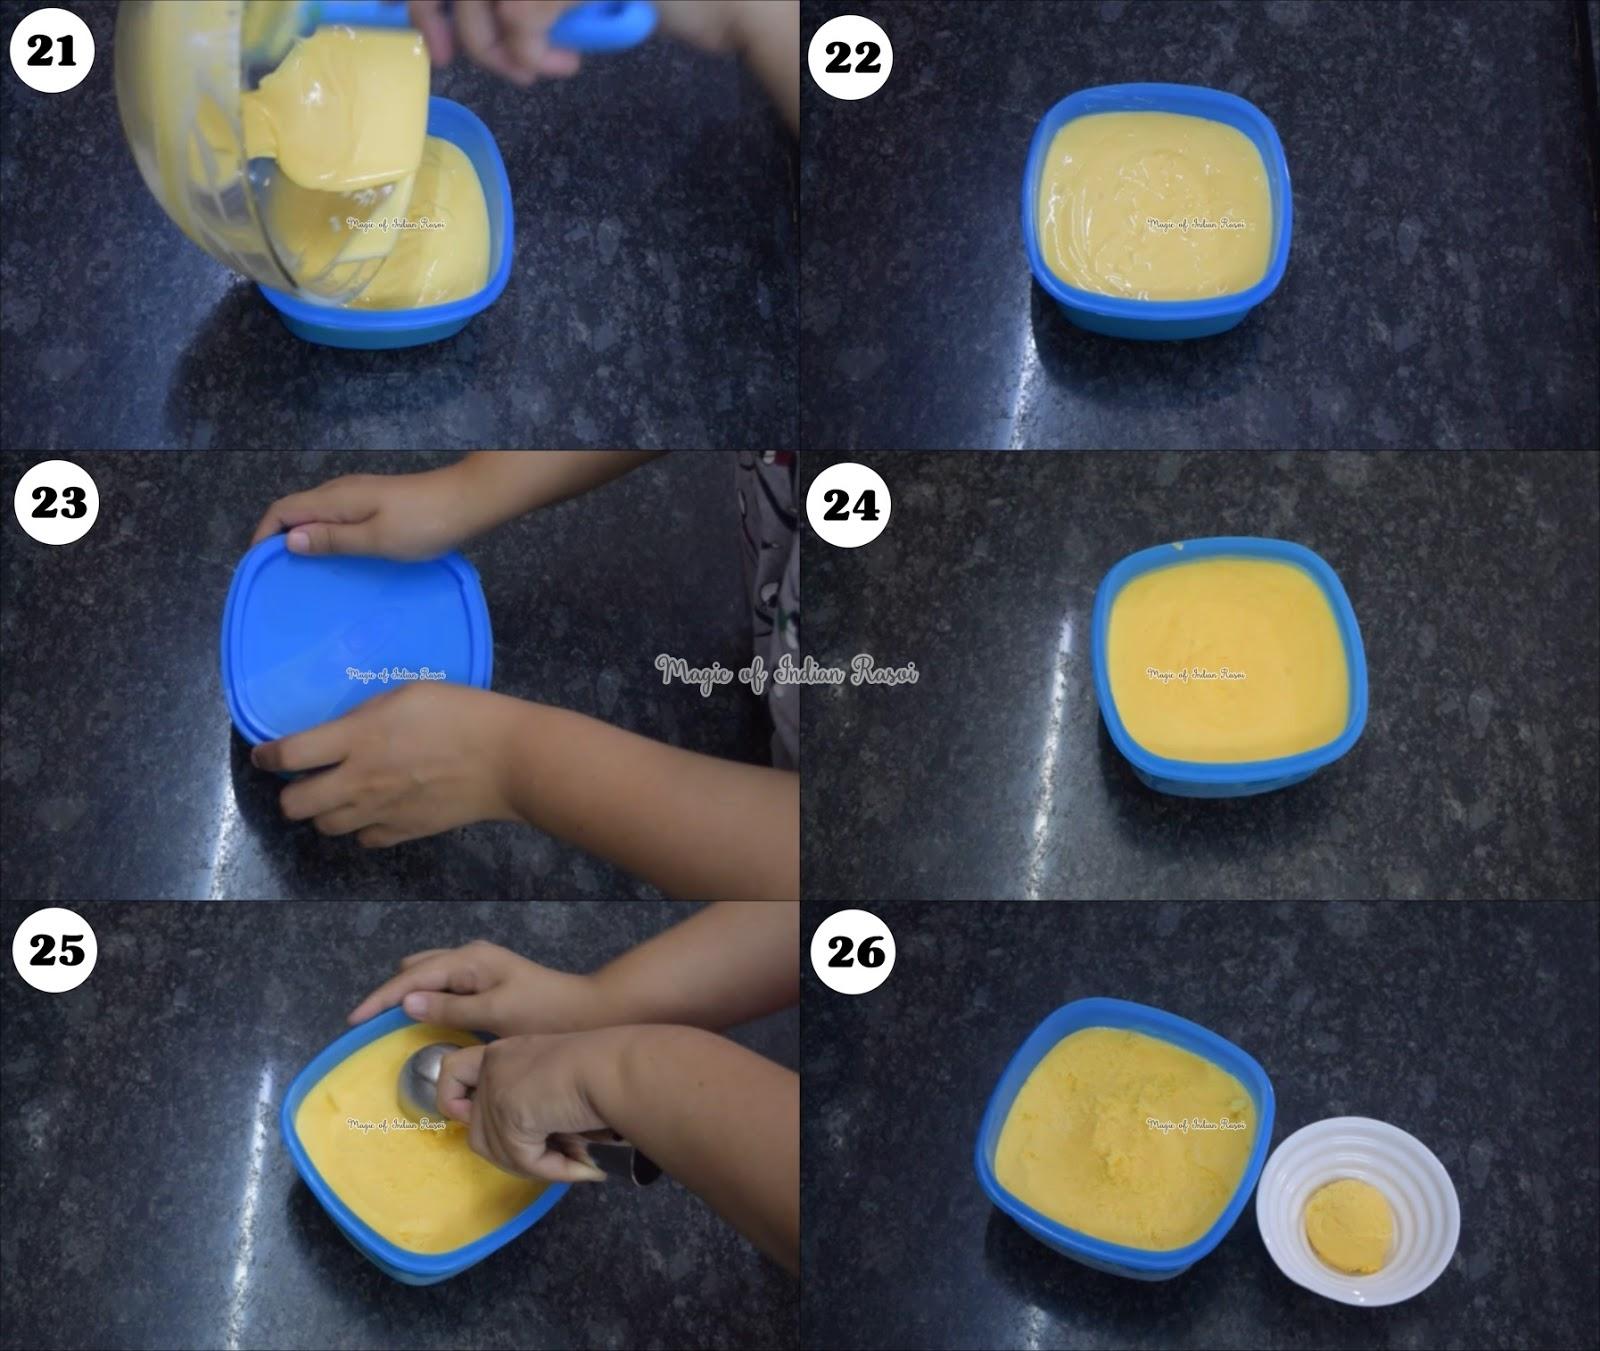 Mango Ice Cream with Amul Fresh Cream - मैंगो आइस क्रीम अमूल क्रीम के साथ  रेसिपी - Priya R - Magic of Indian Rasoi